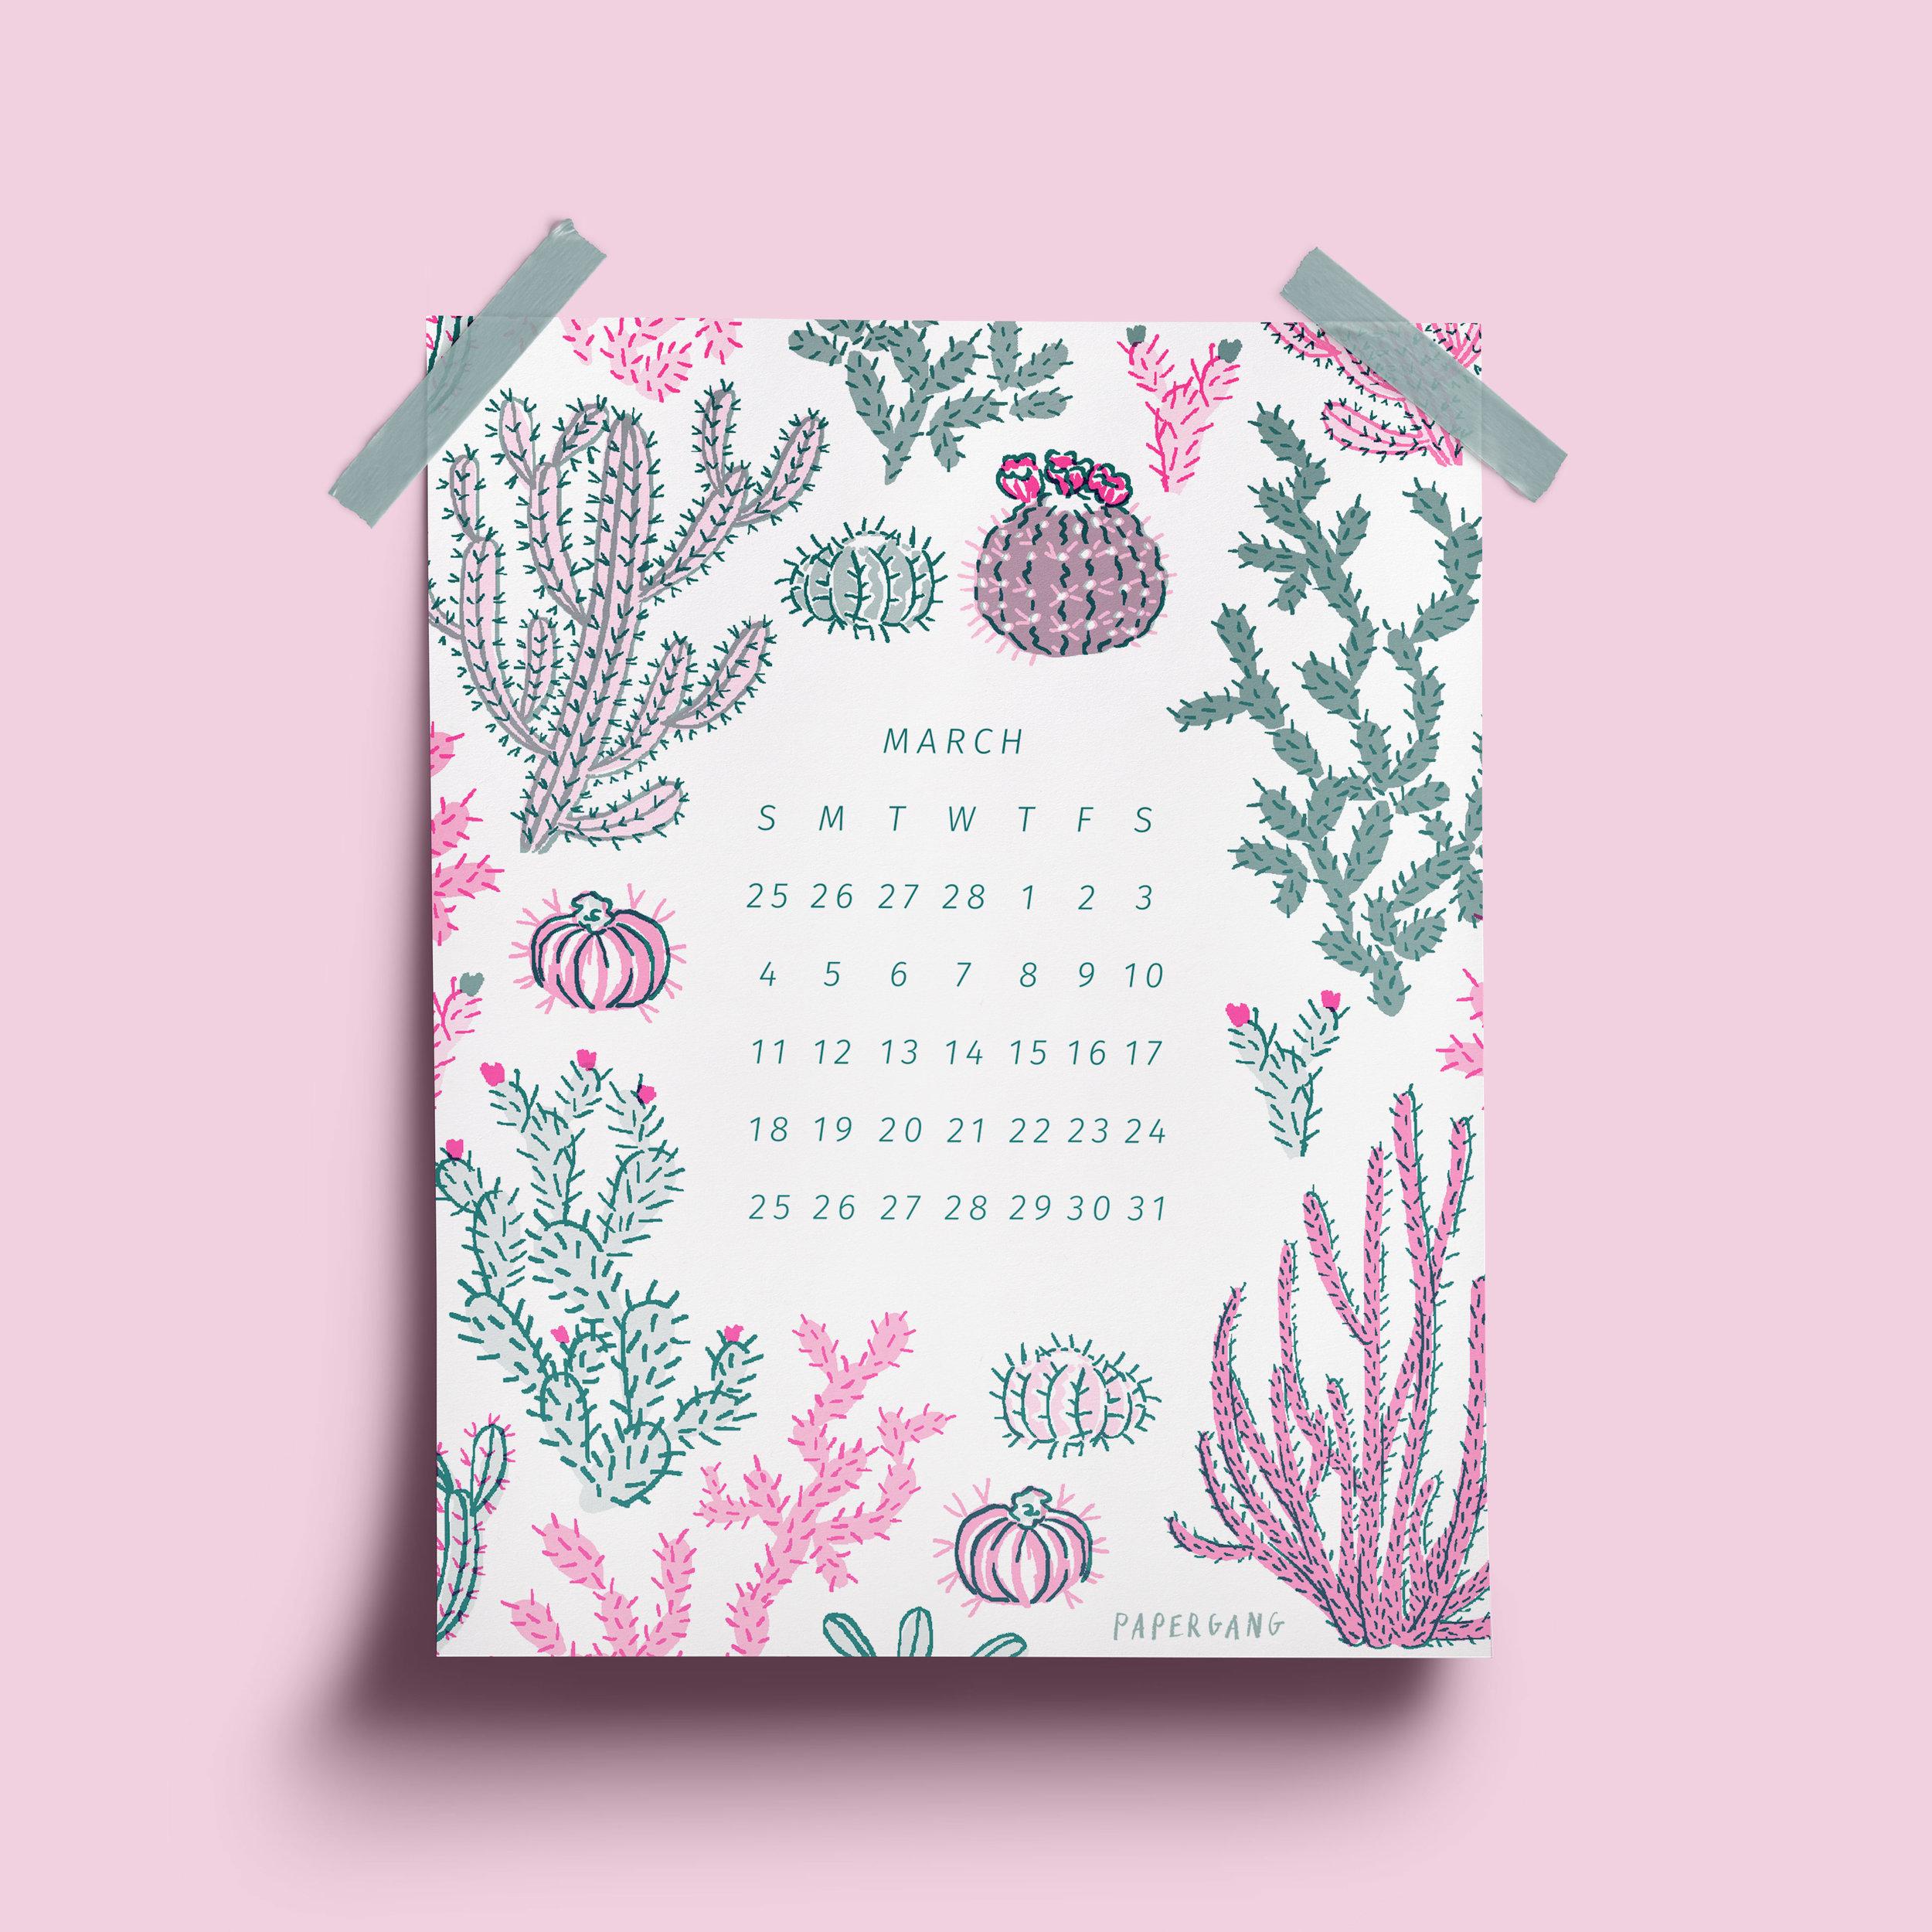 Papergang-March-2018-Calendar-Mock-Up.jpg